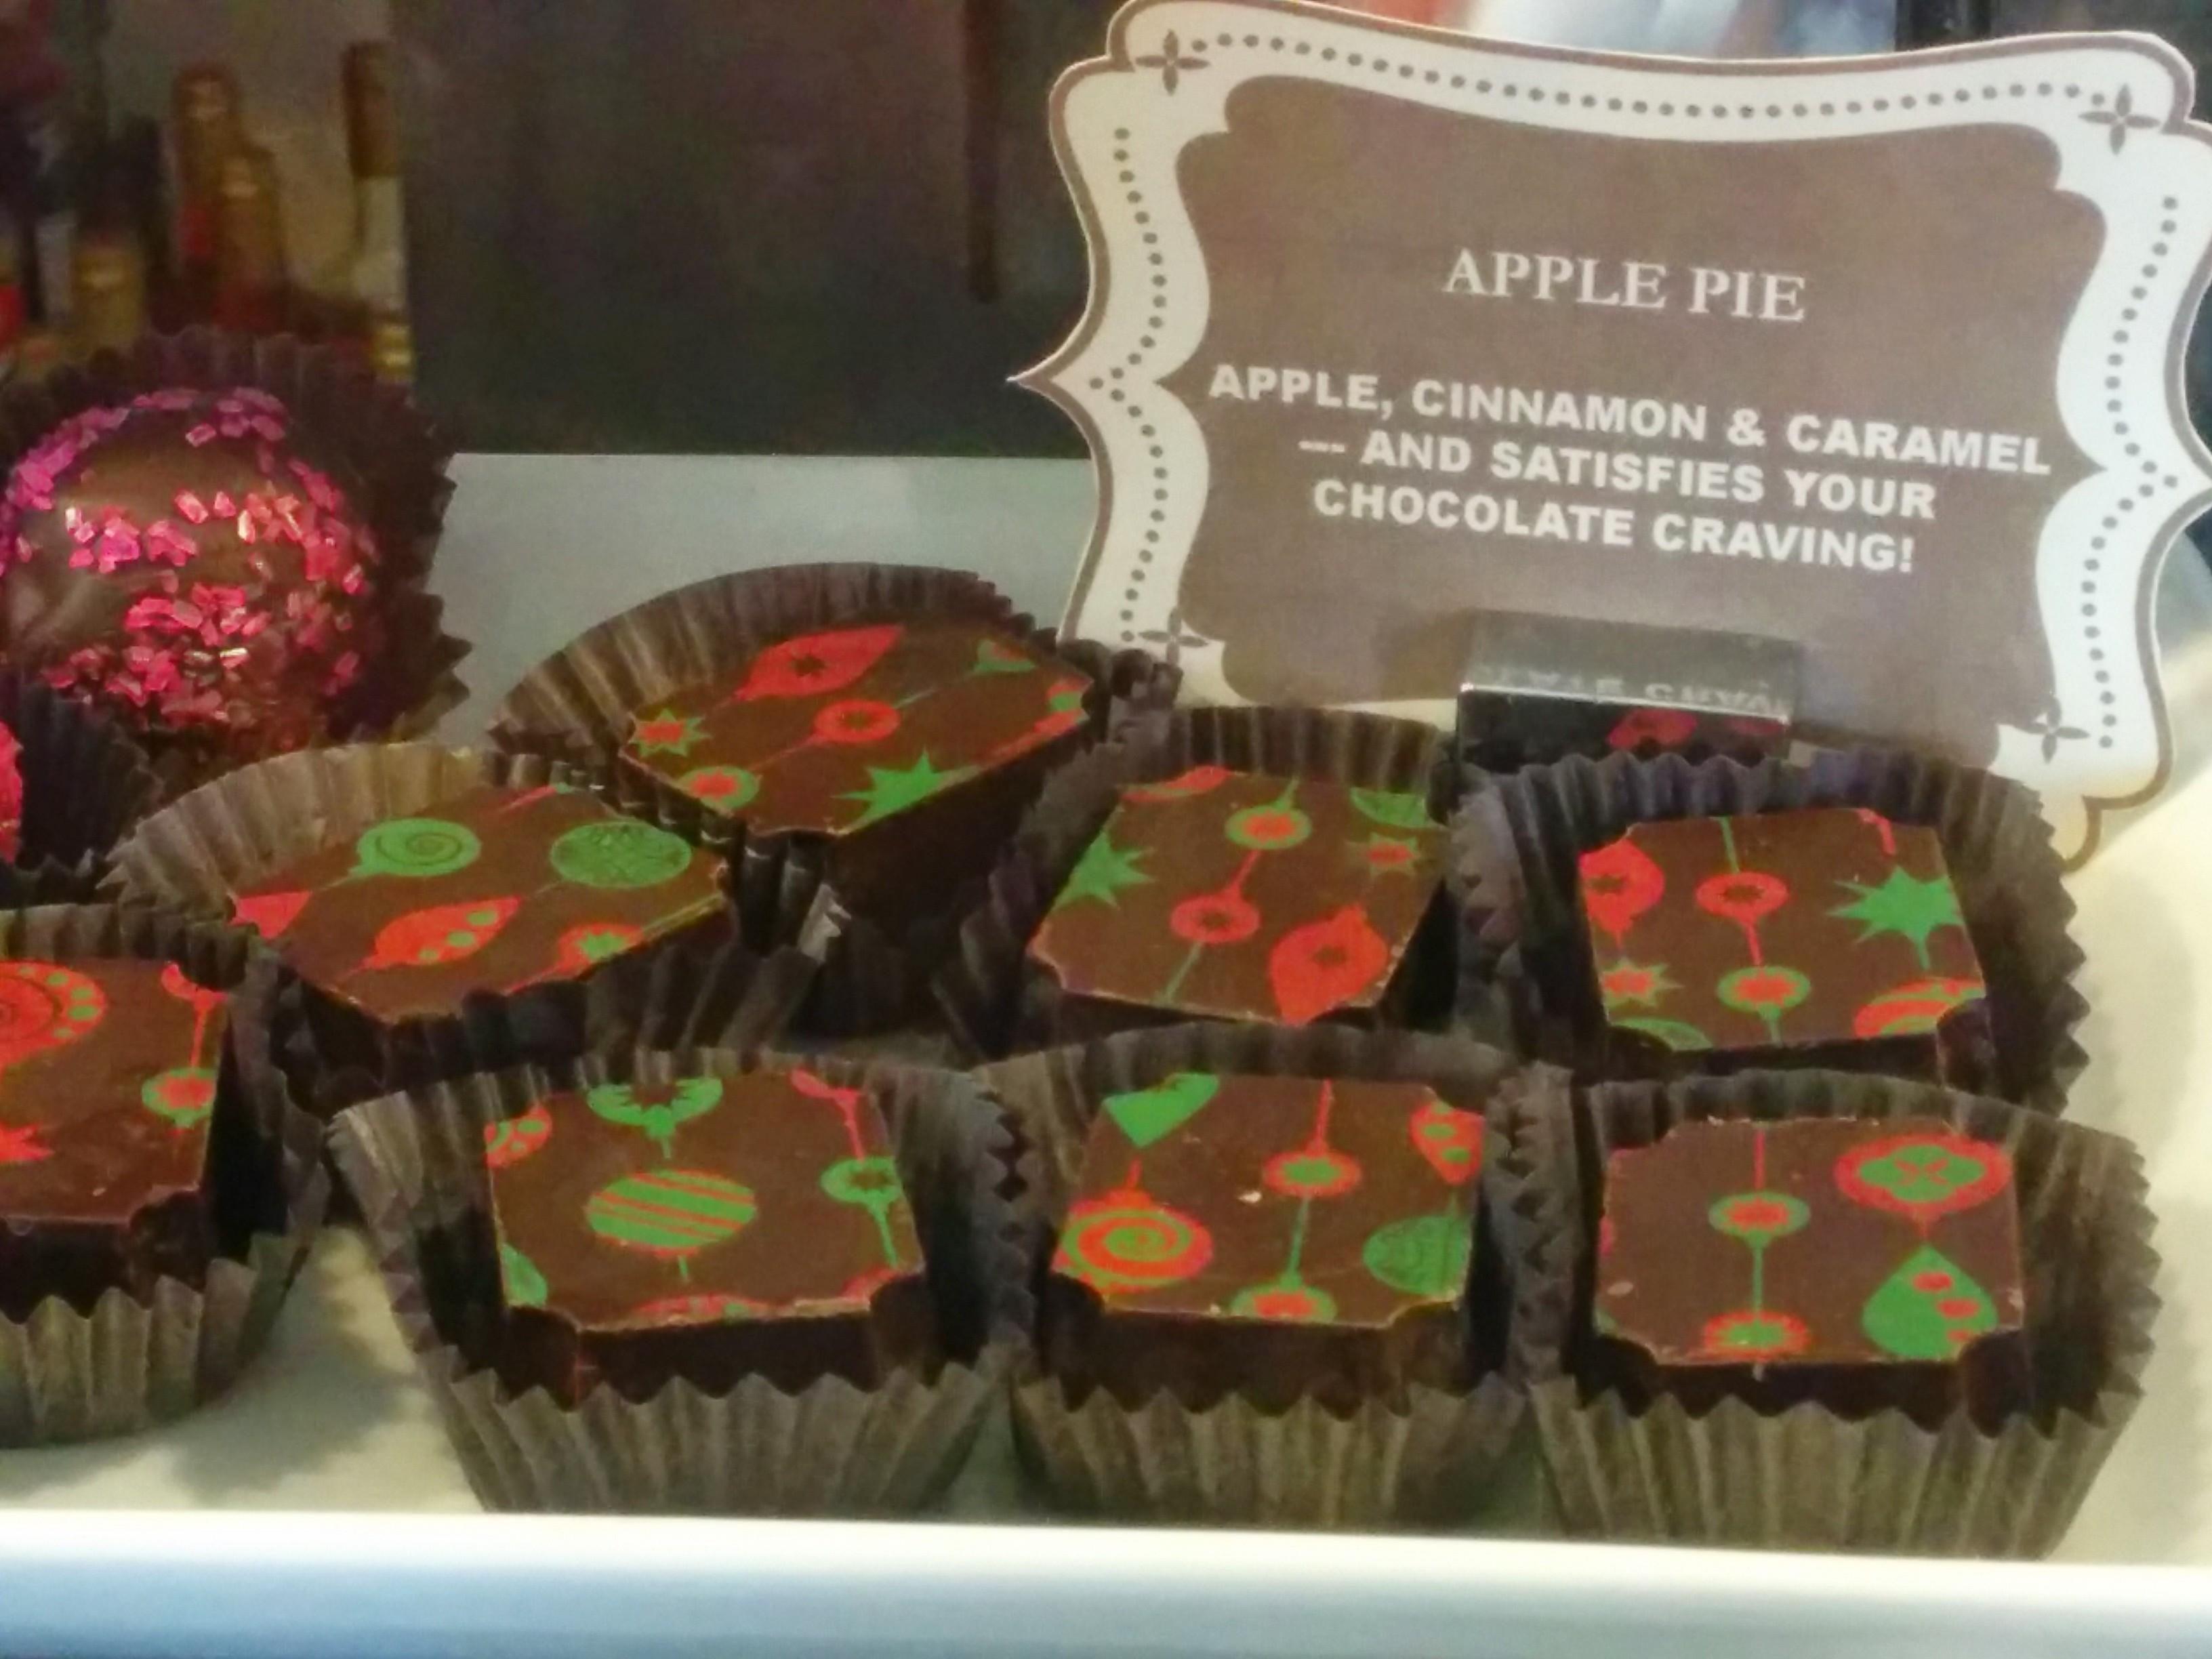 Apple Pie chocolates